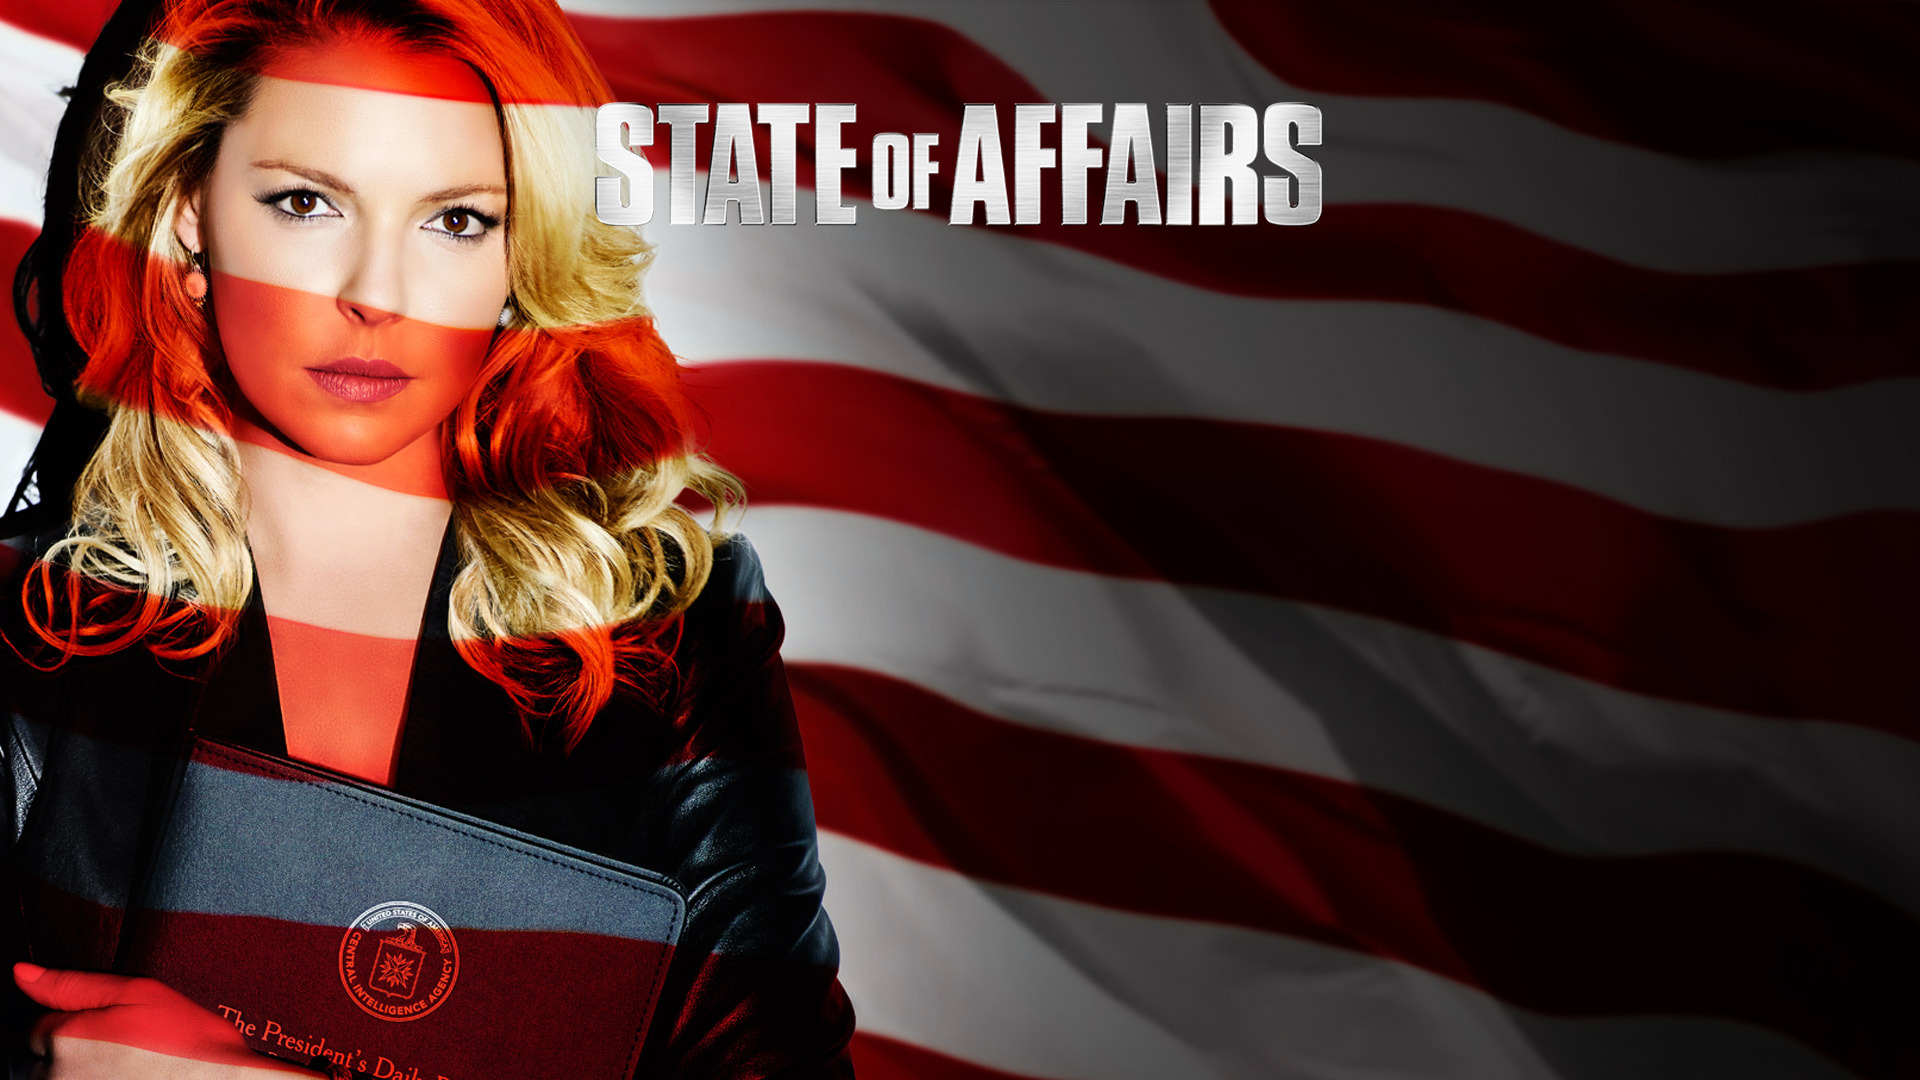 State of Affairs, Season 1